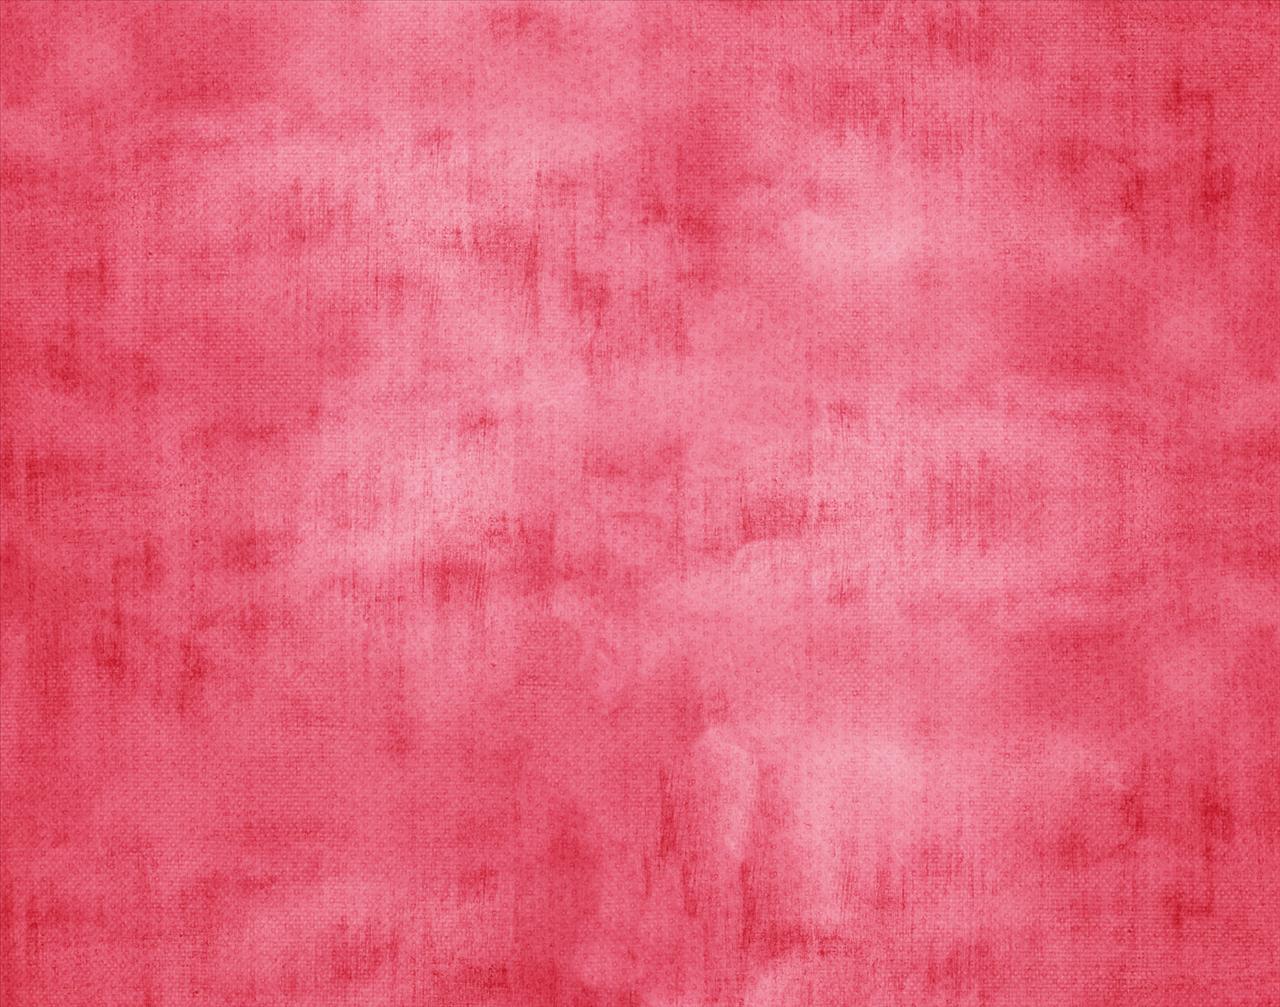 Plain Background Images - Wallpaper Cave |Plain Pink Backgrounds